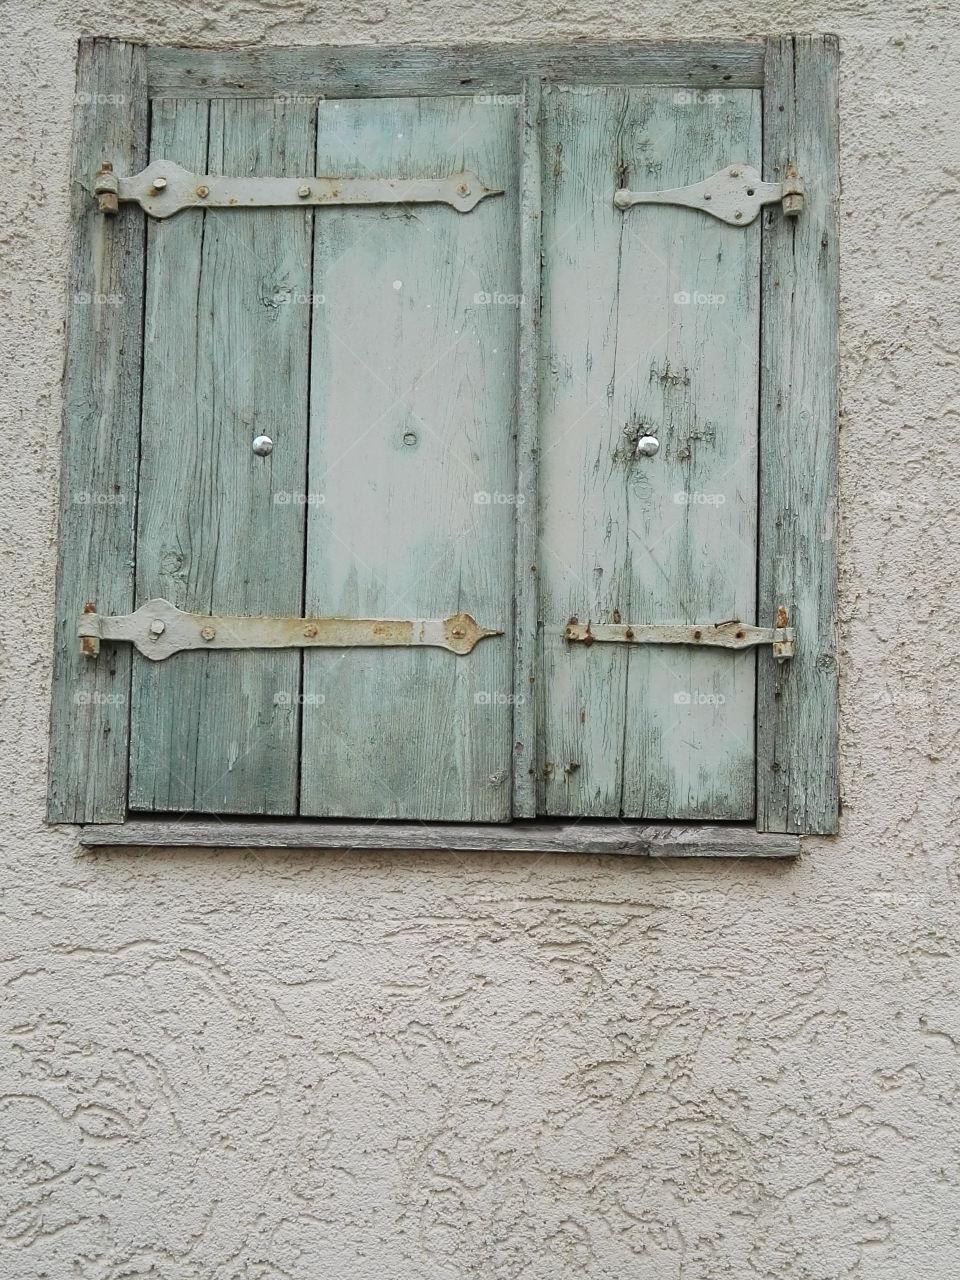 verry old vintage window shutter